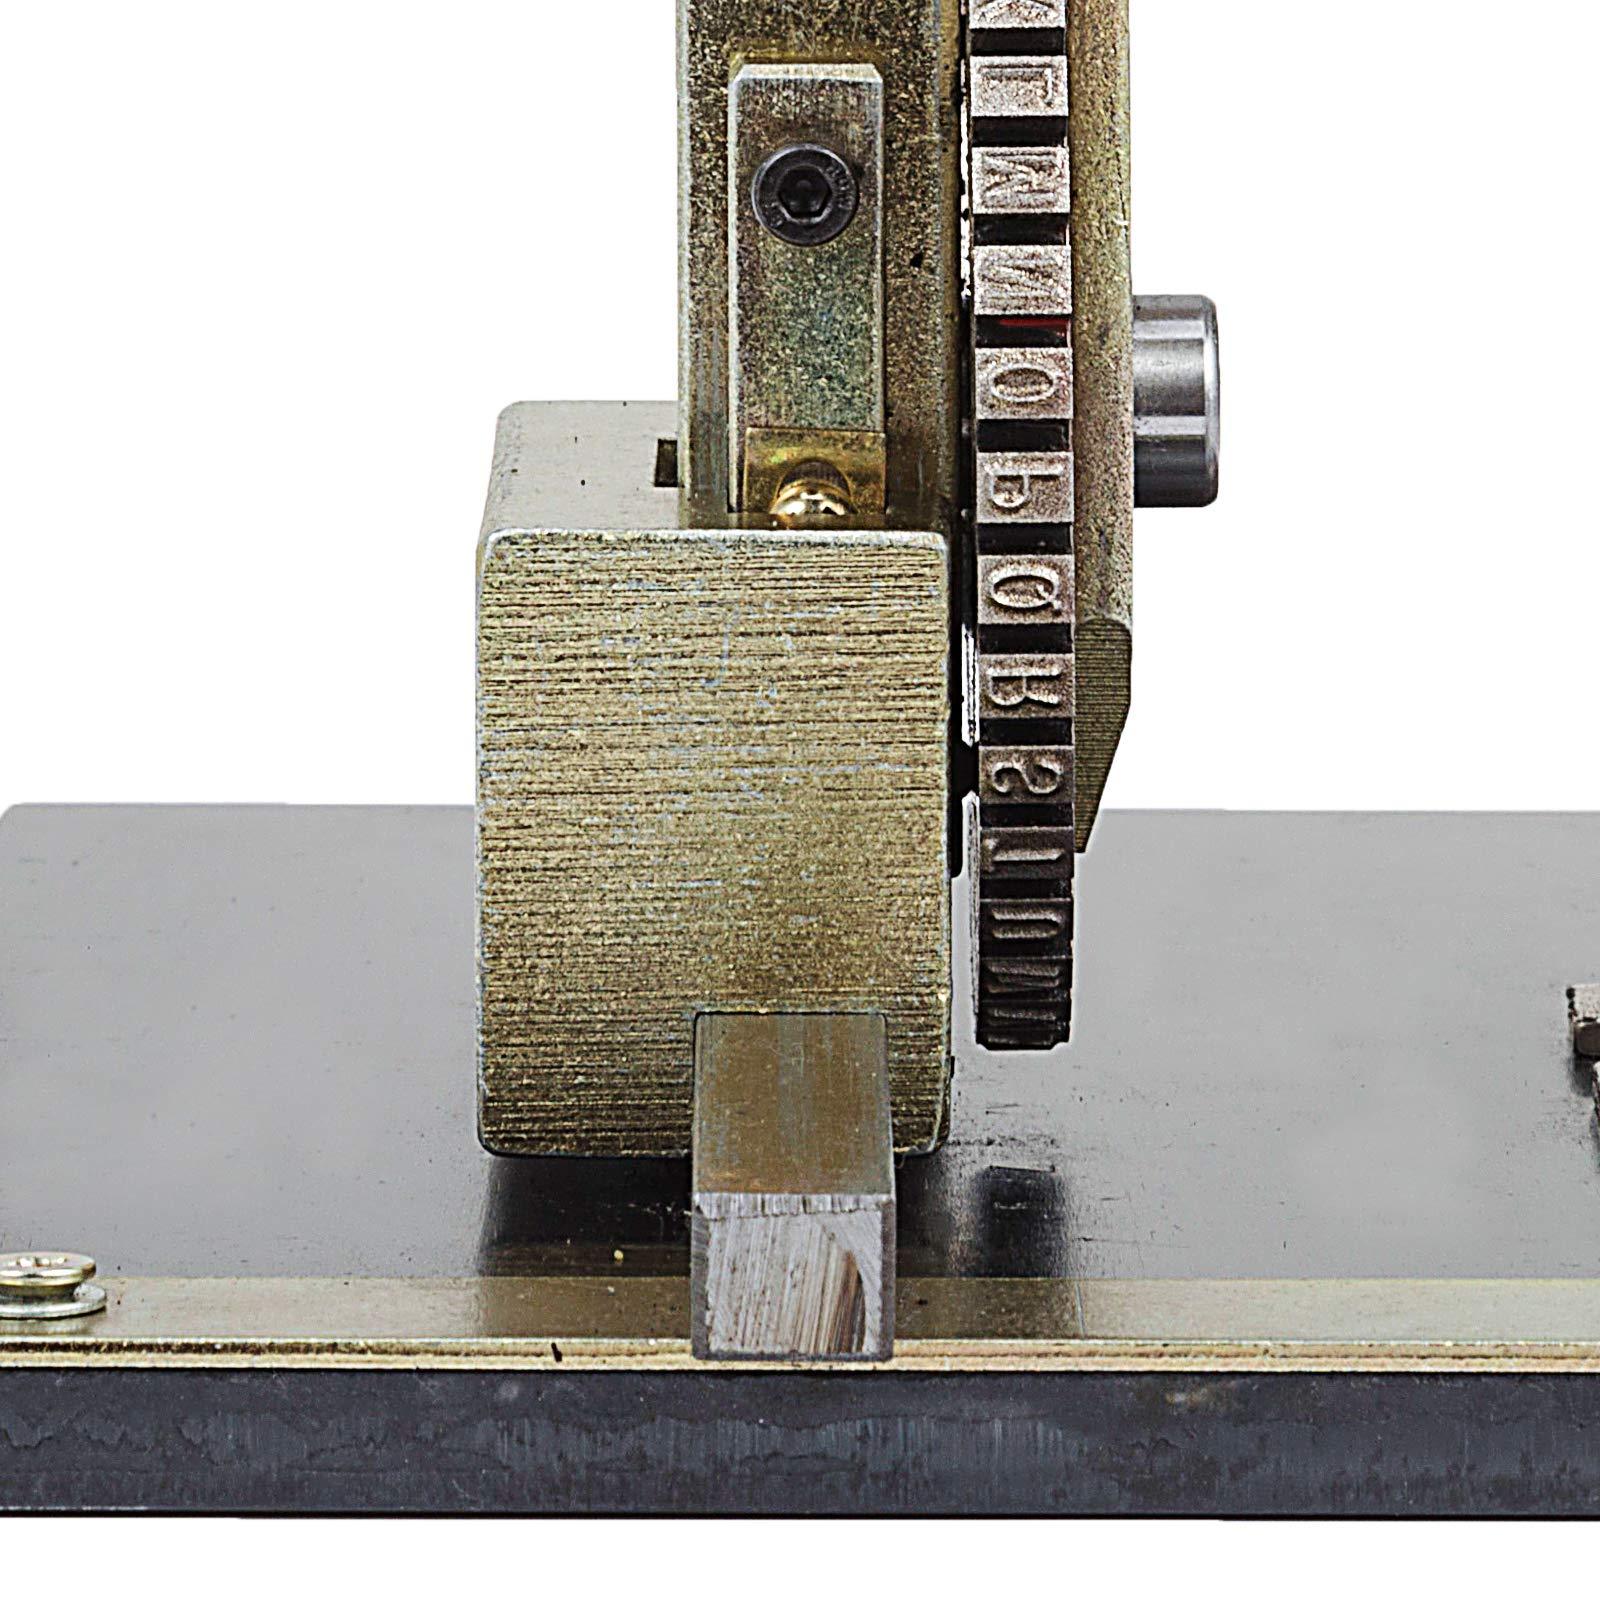 VEVOR Sheet Embosser Manual Deboss Metal Embosser Machine Dog Tag Specific Model Date Serial Number Stamping Embossing Marking Machine with 4MM Print Wheel by VEVOR (Image #8)